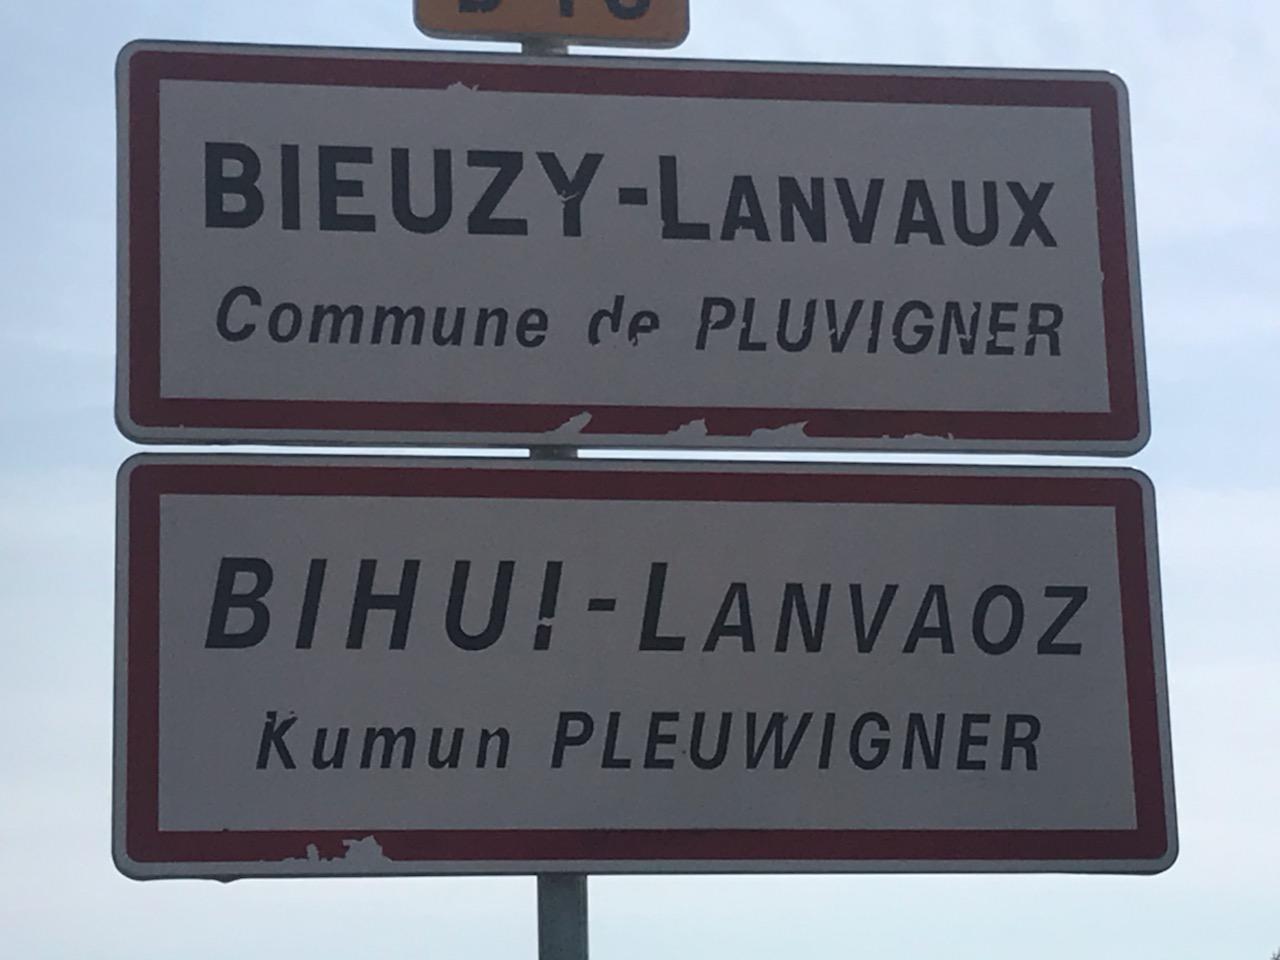 PLUVIGNER - BIEUZY LANVAUX PONTERLIC